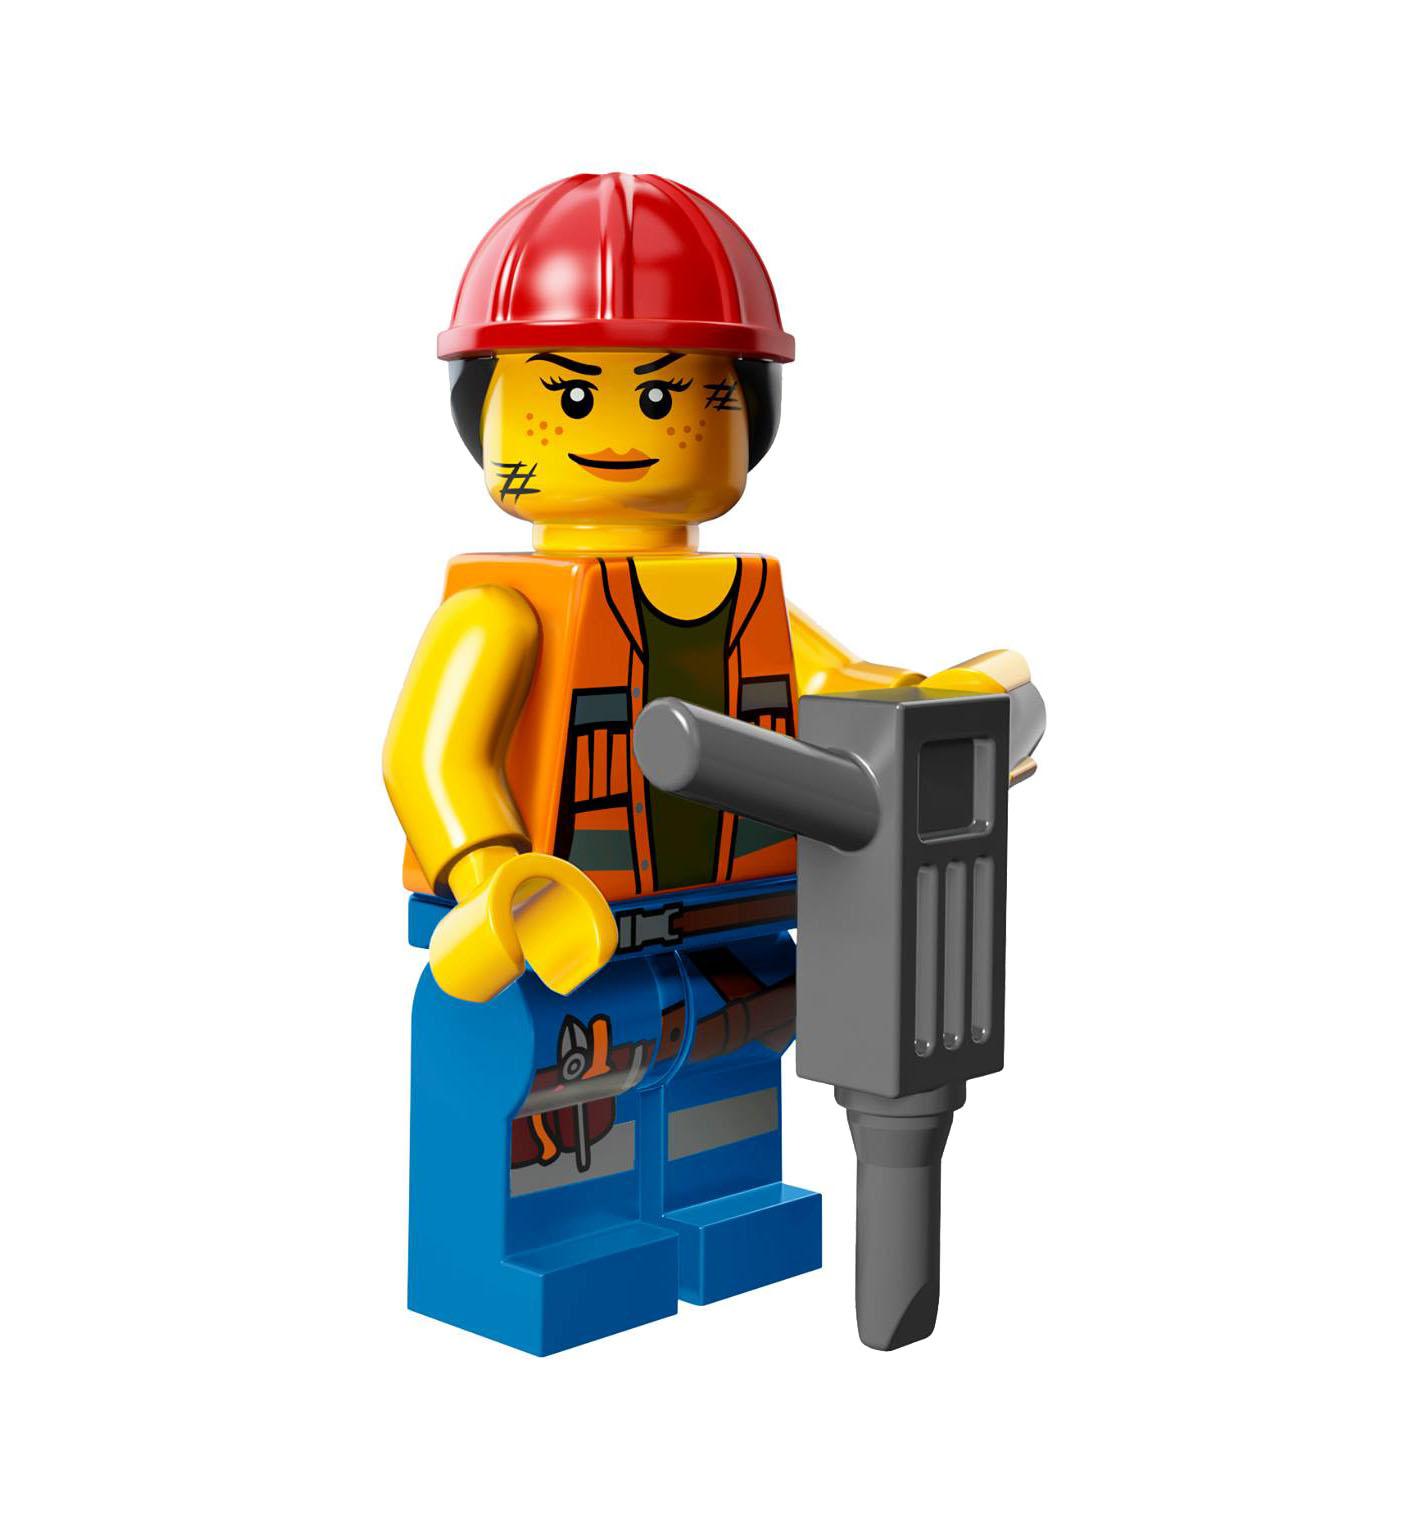 Lego man movie character clipart image freeuse 71004 The LEGO Movie Series | Brickipedia | Fandom powered by Wikia image freeuse